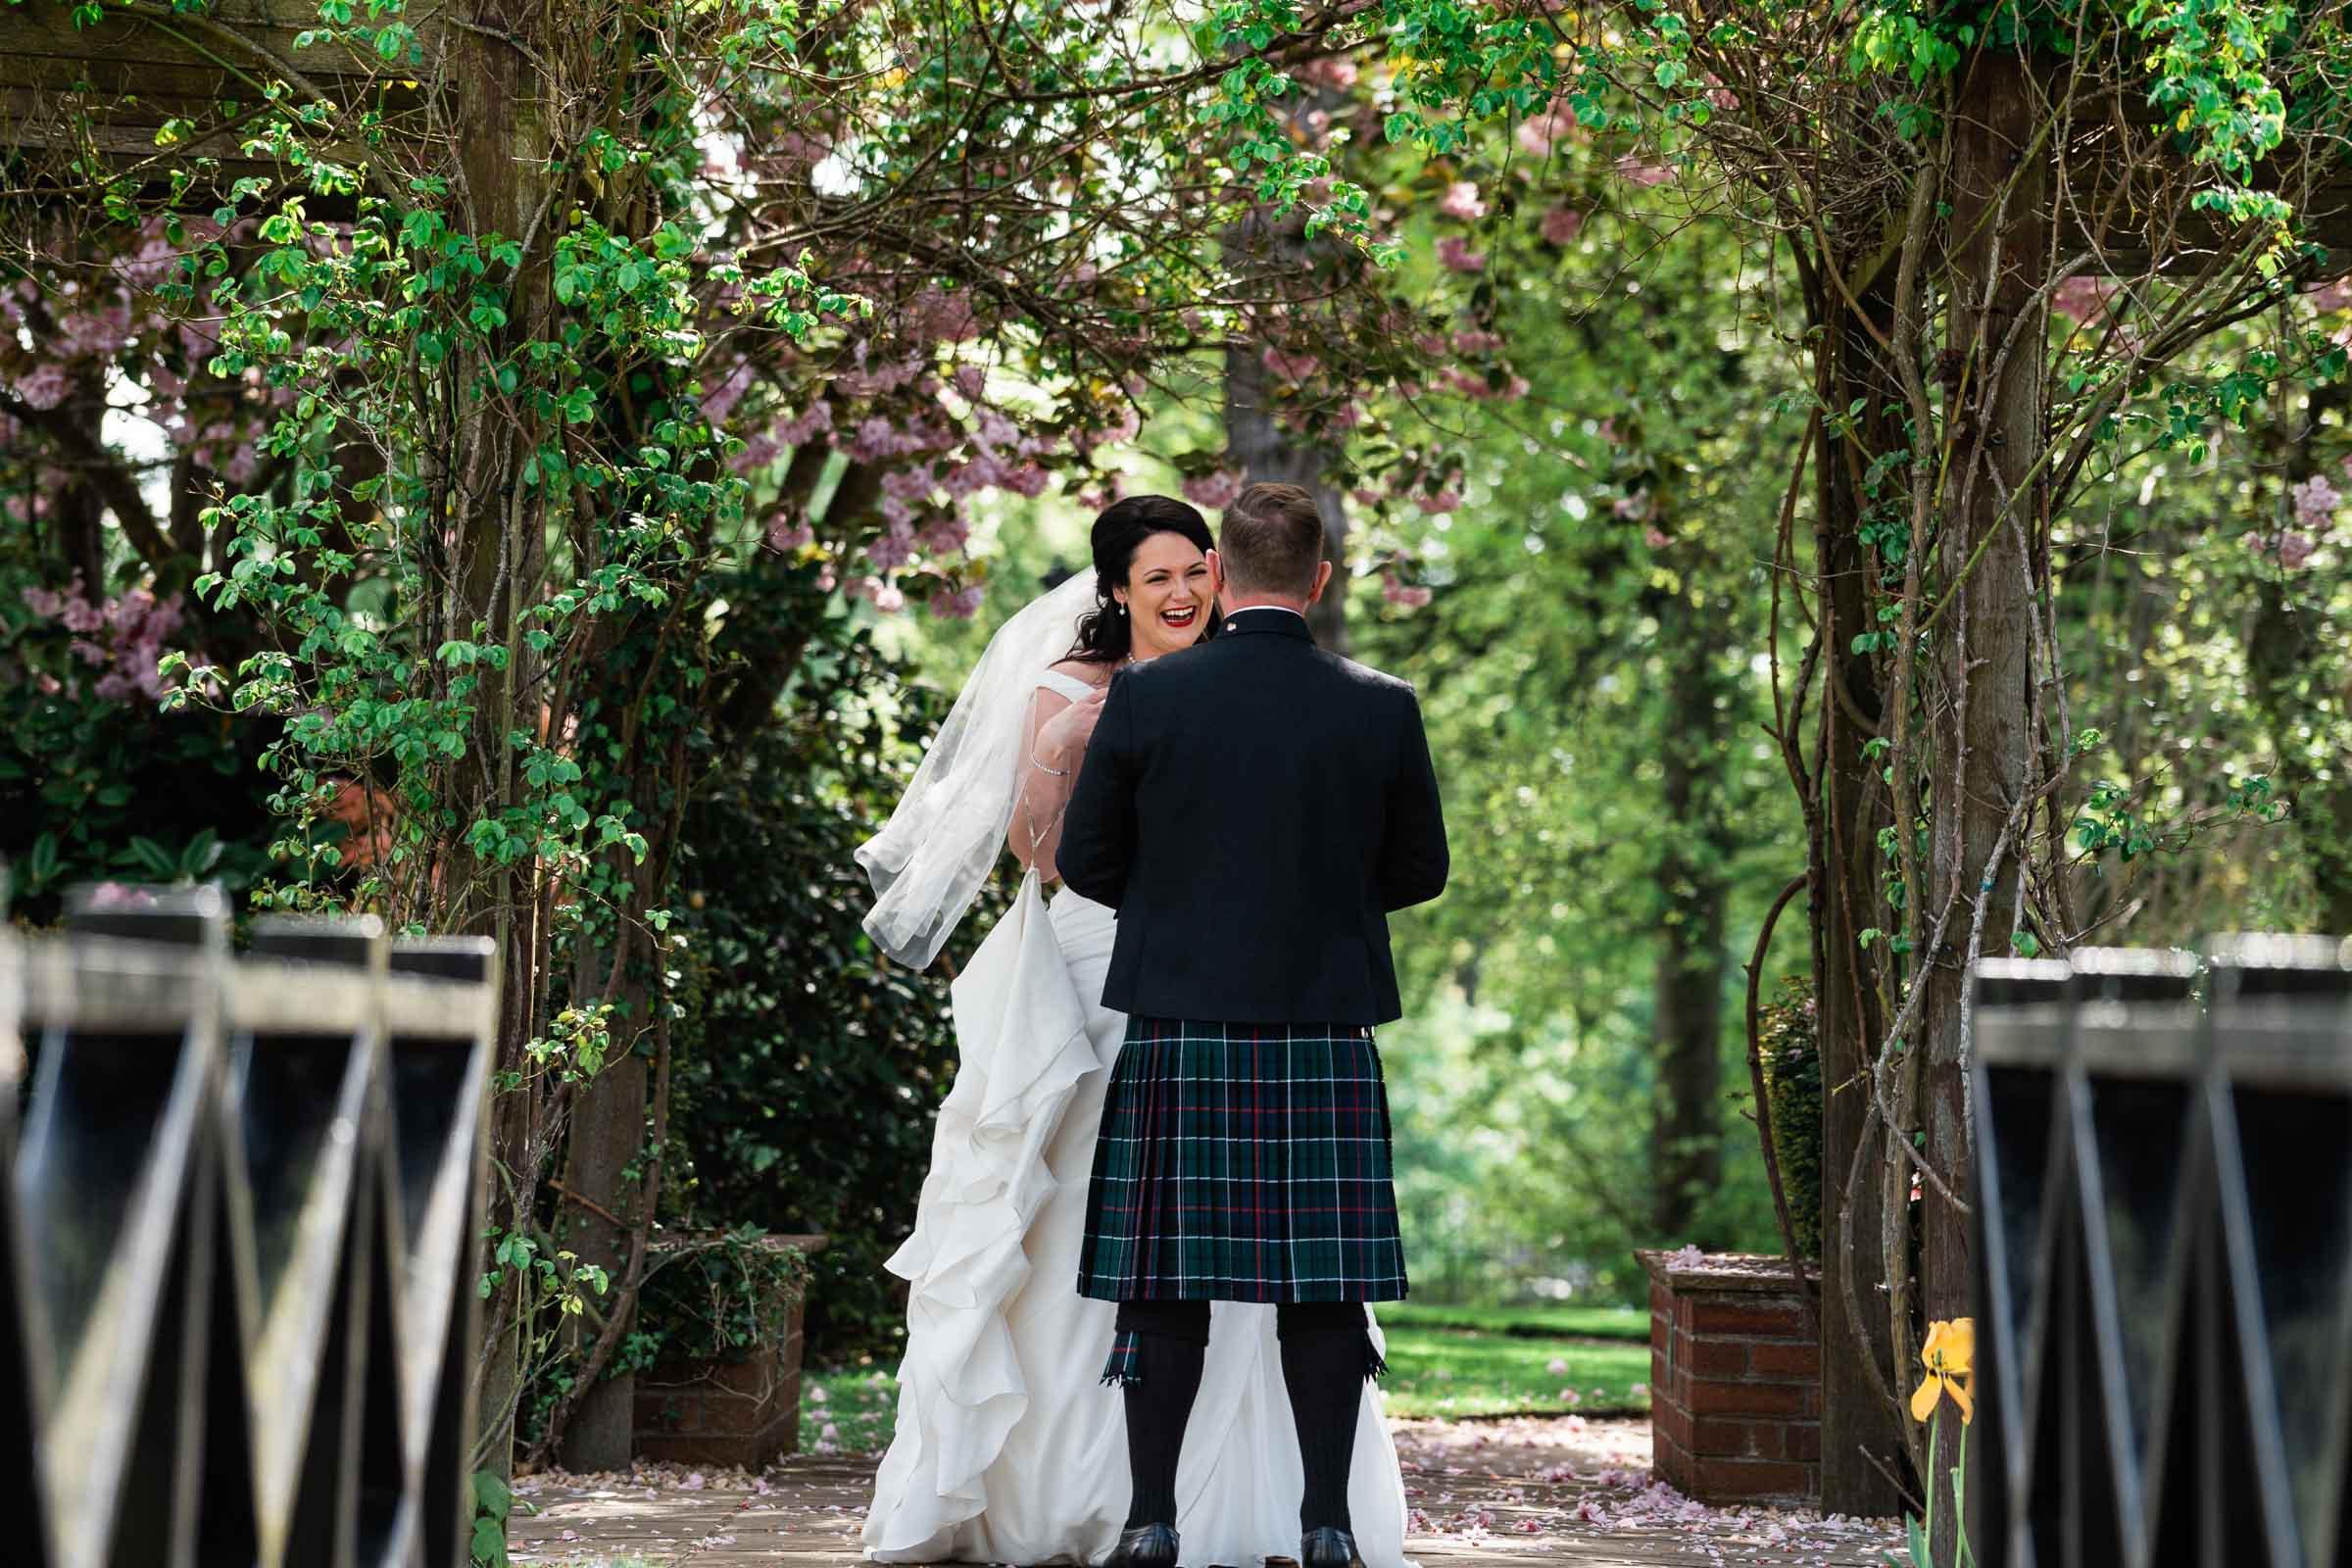 western-house-hotel-ayrshire-wedding-dearlyphotography (15 of 19).jpg